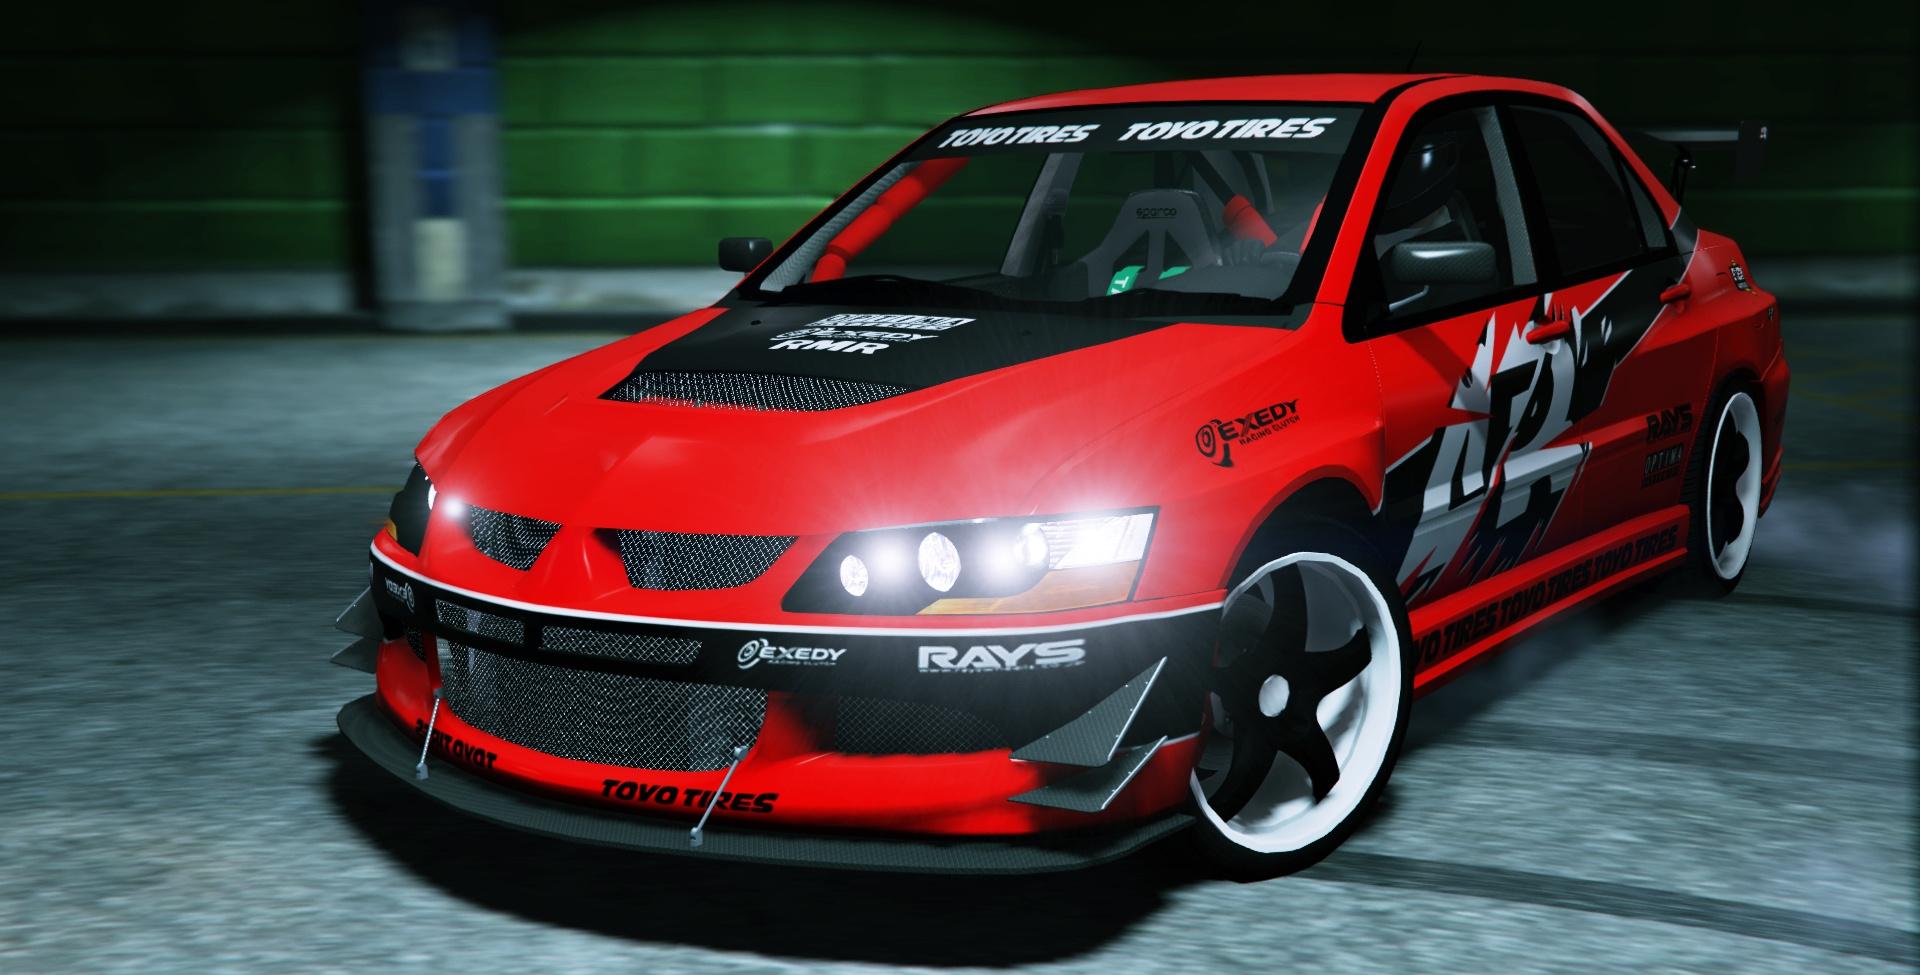 Fnf Tokyo Drift 2006 Mitsubishi Lancer Evolution Ix Gta5 Mods Com